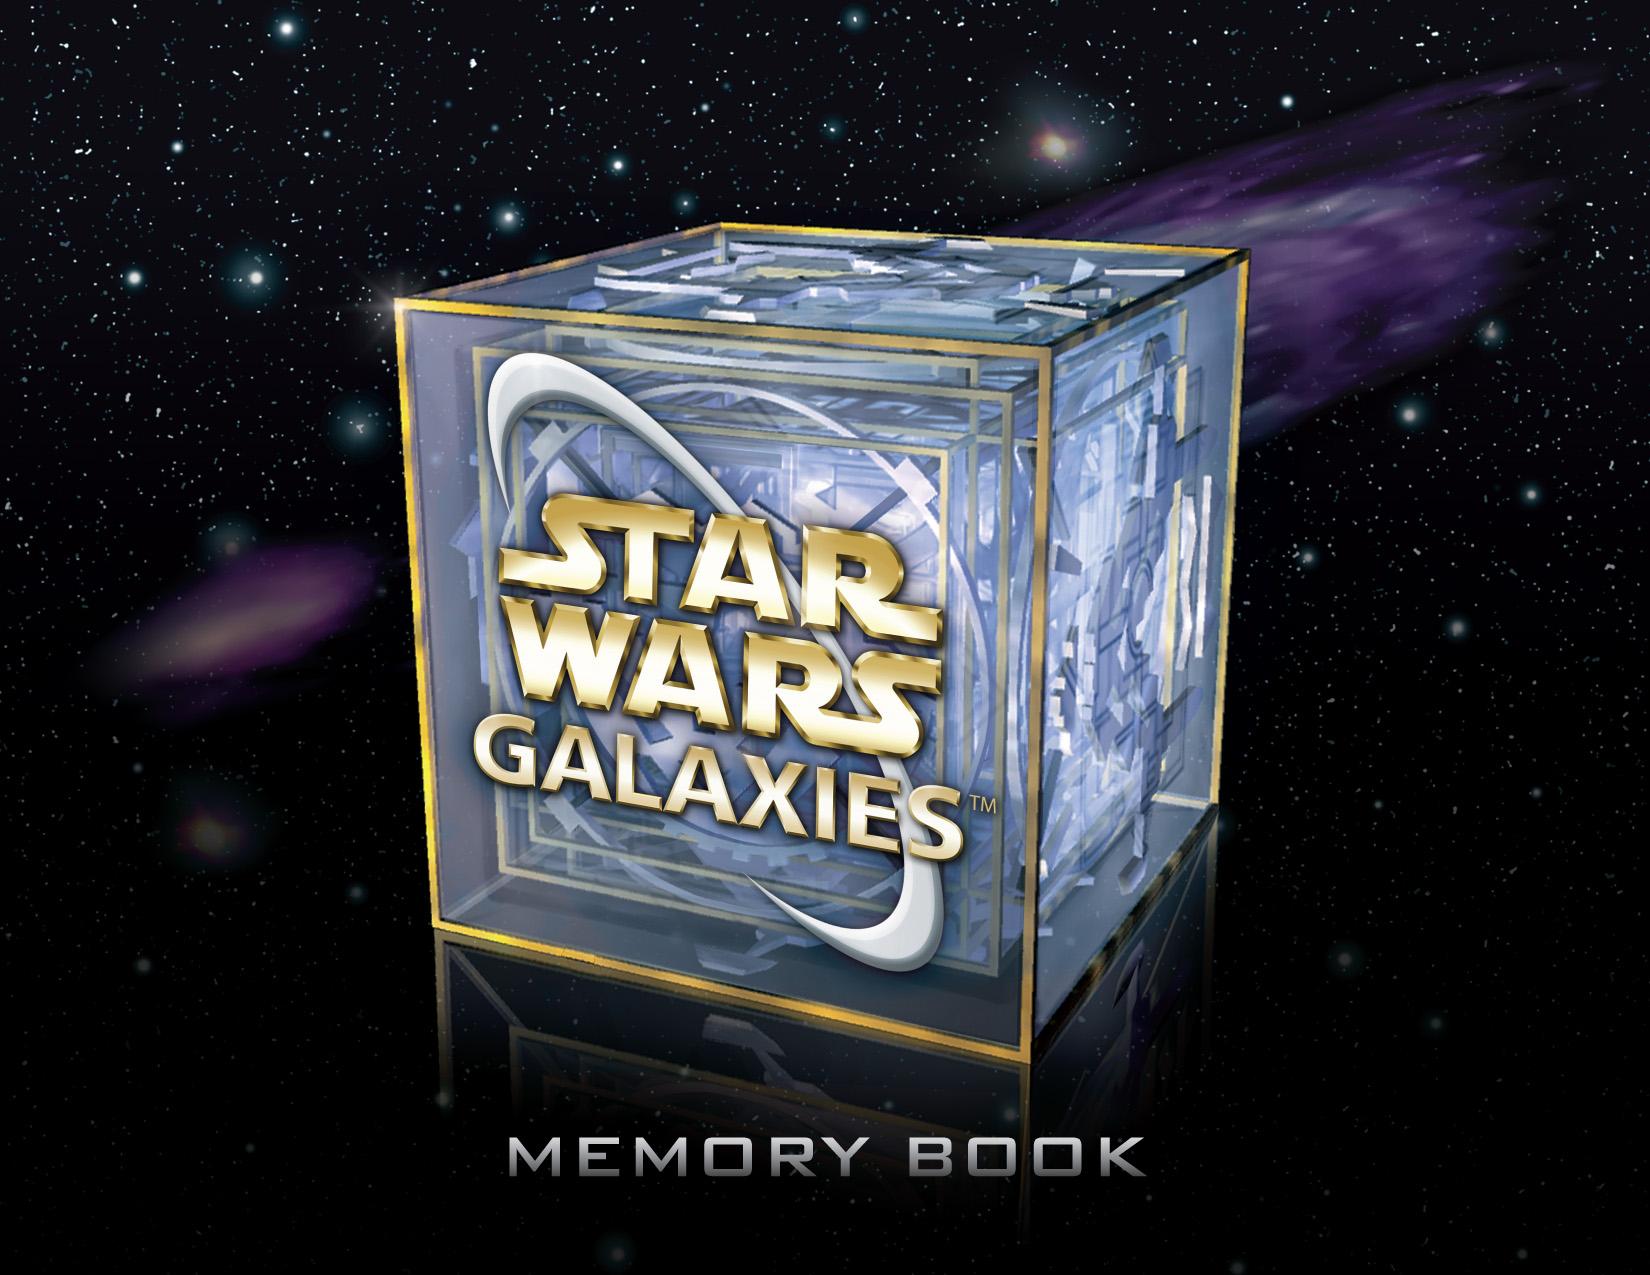 Star wars: galaxy of heroes hack tool [online, no download].